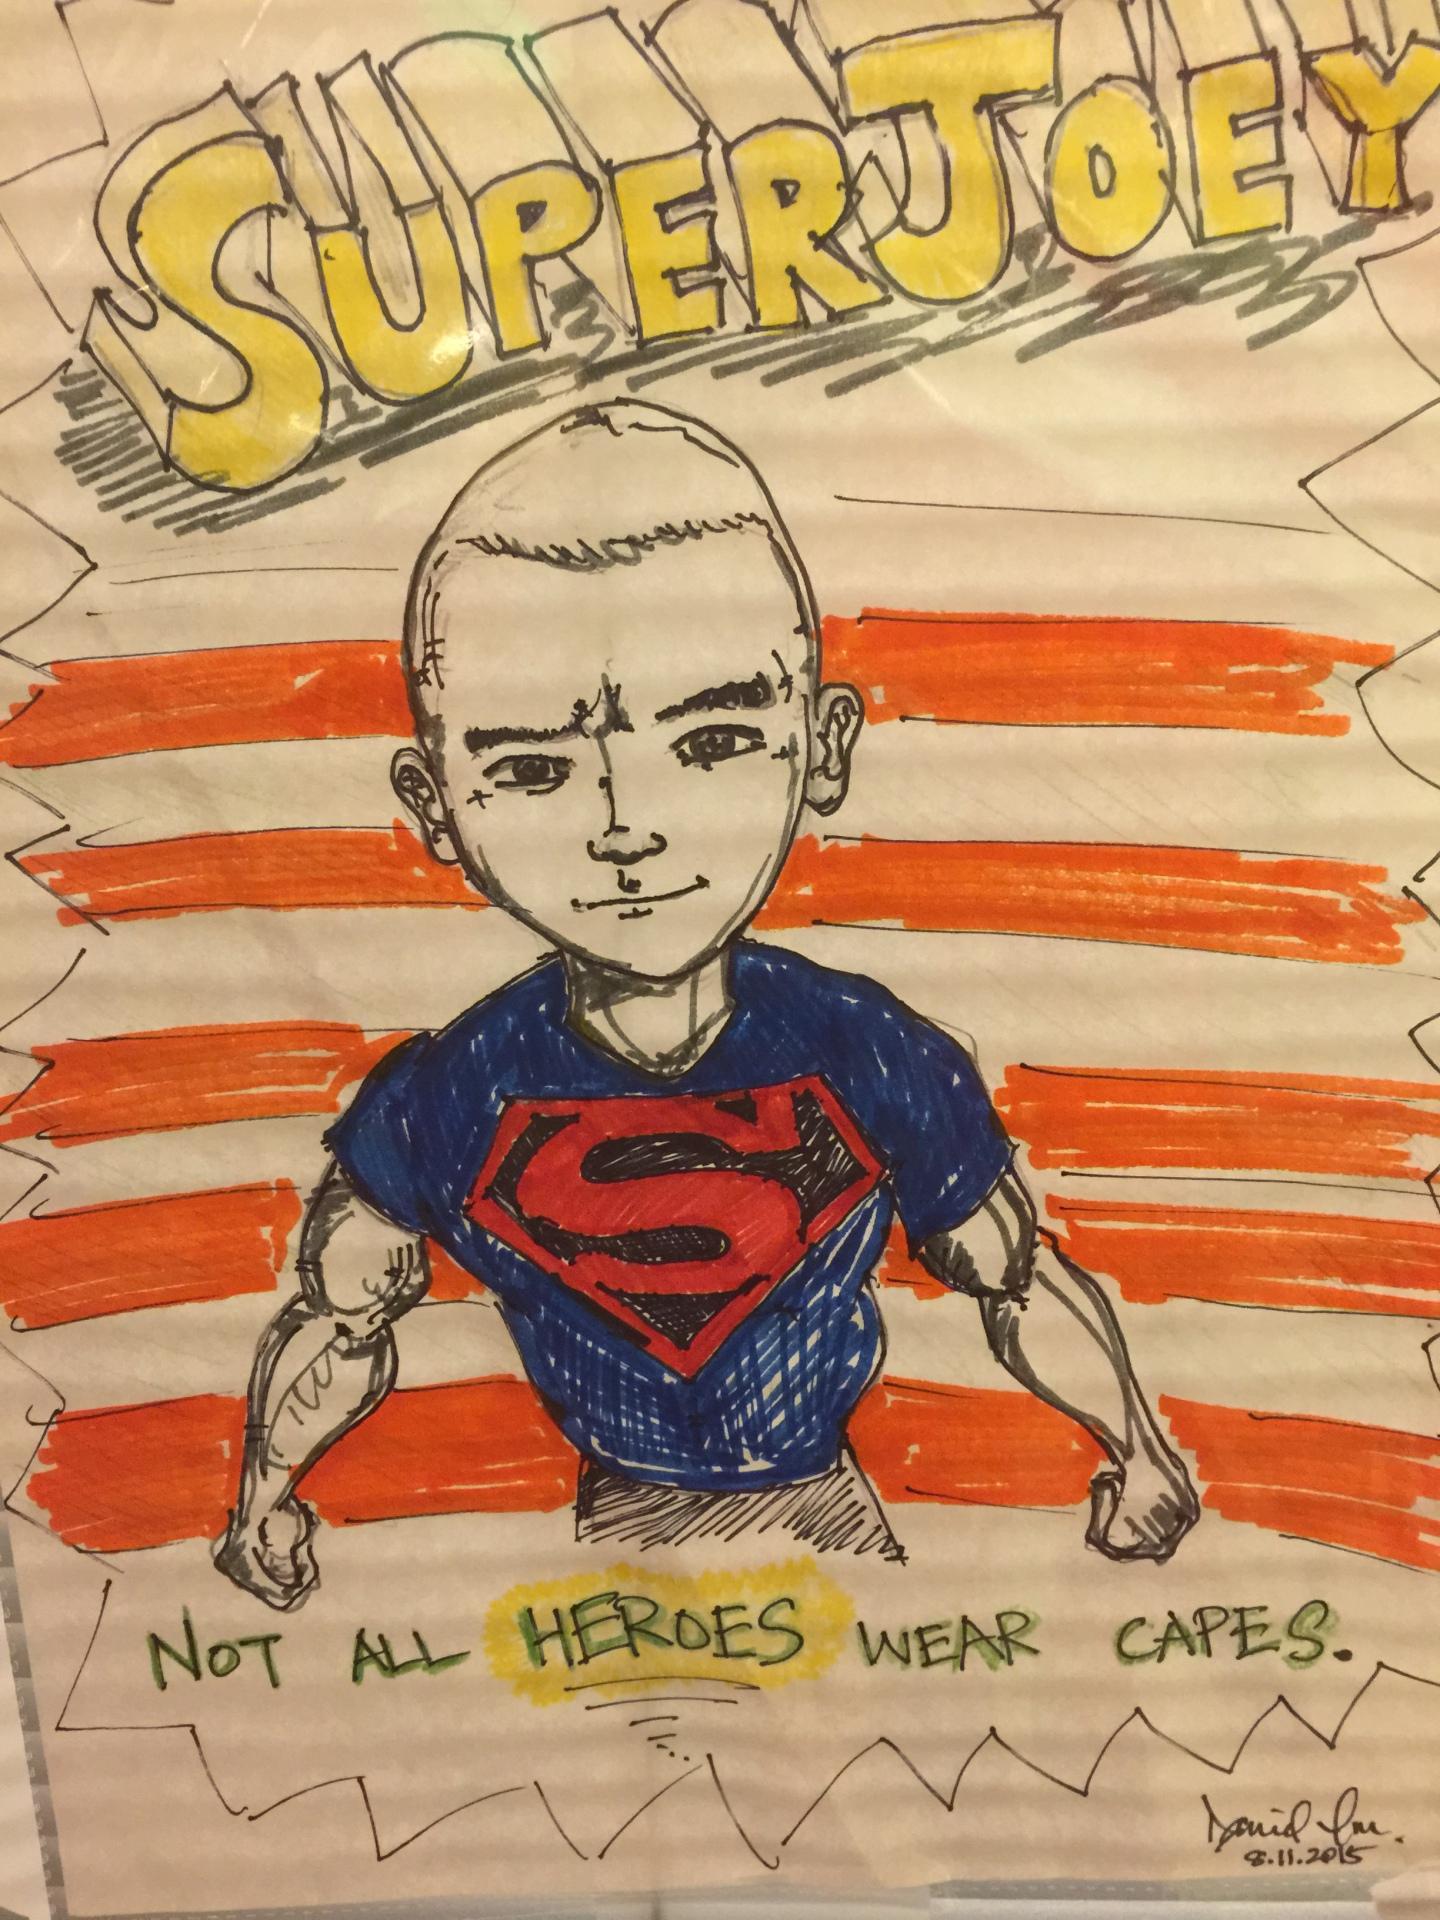 Super Joey